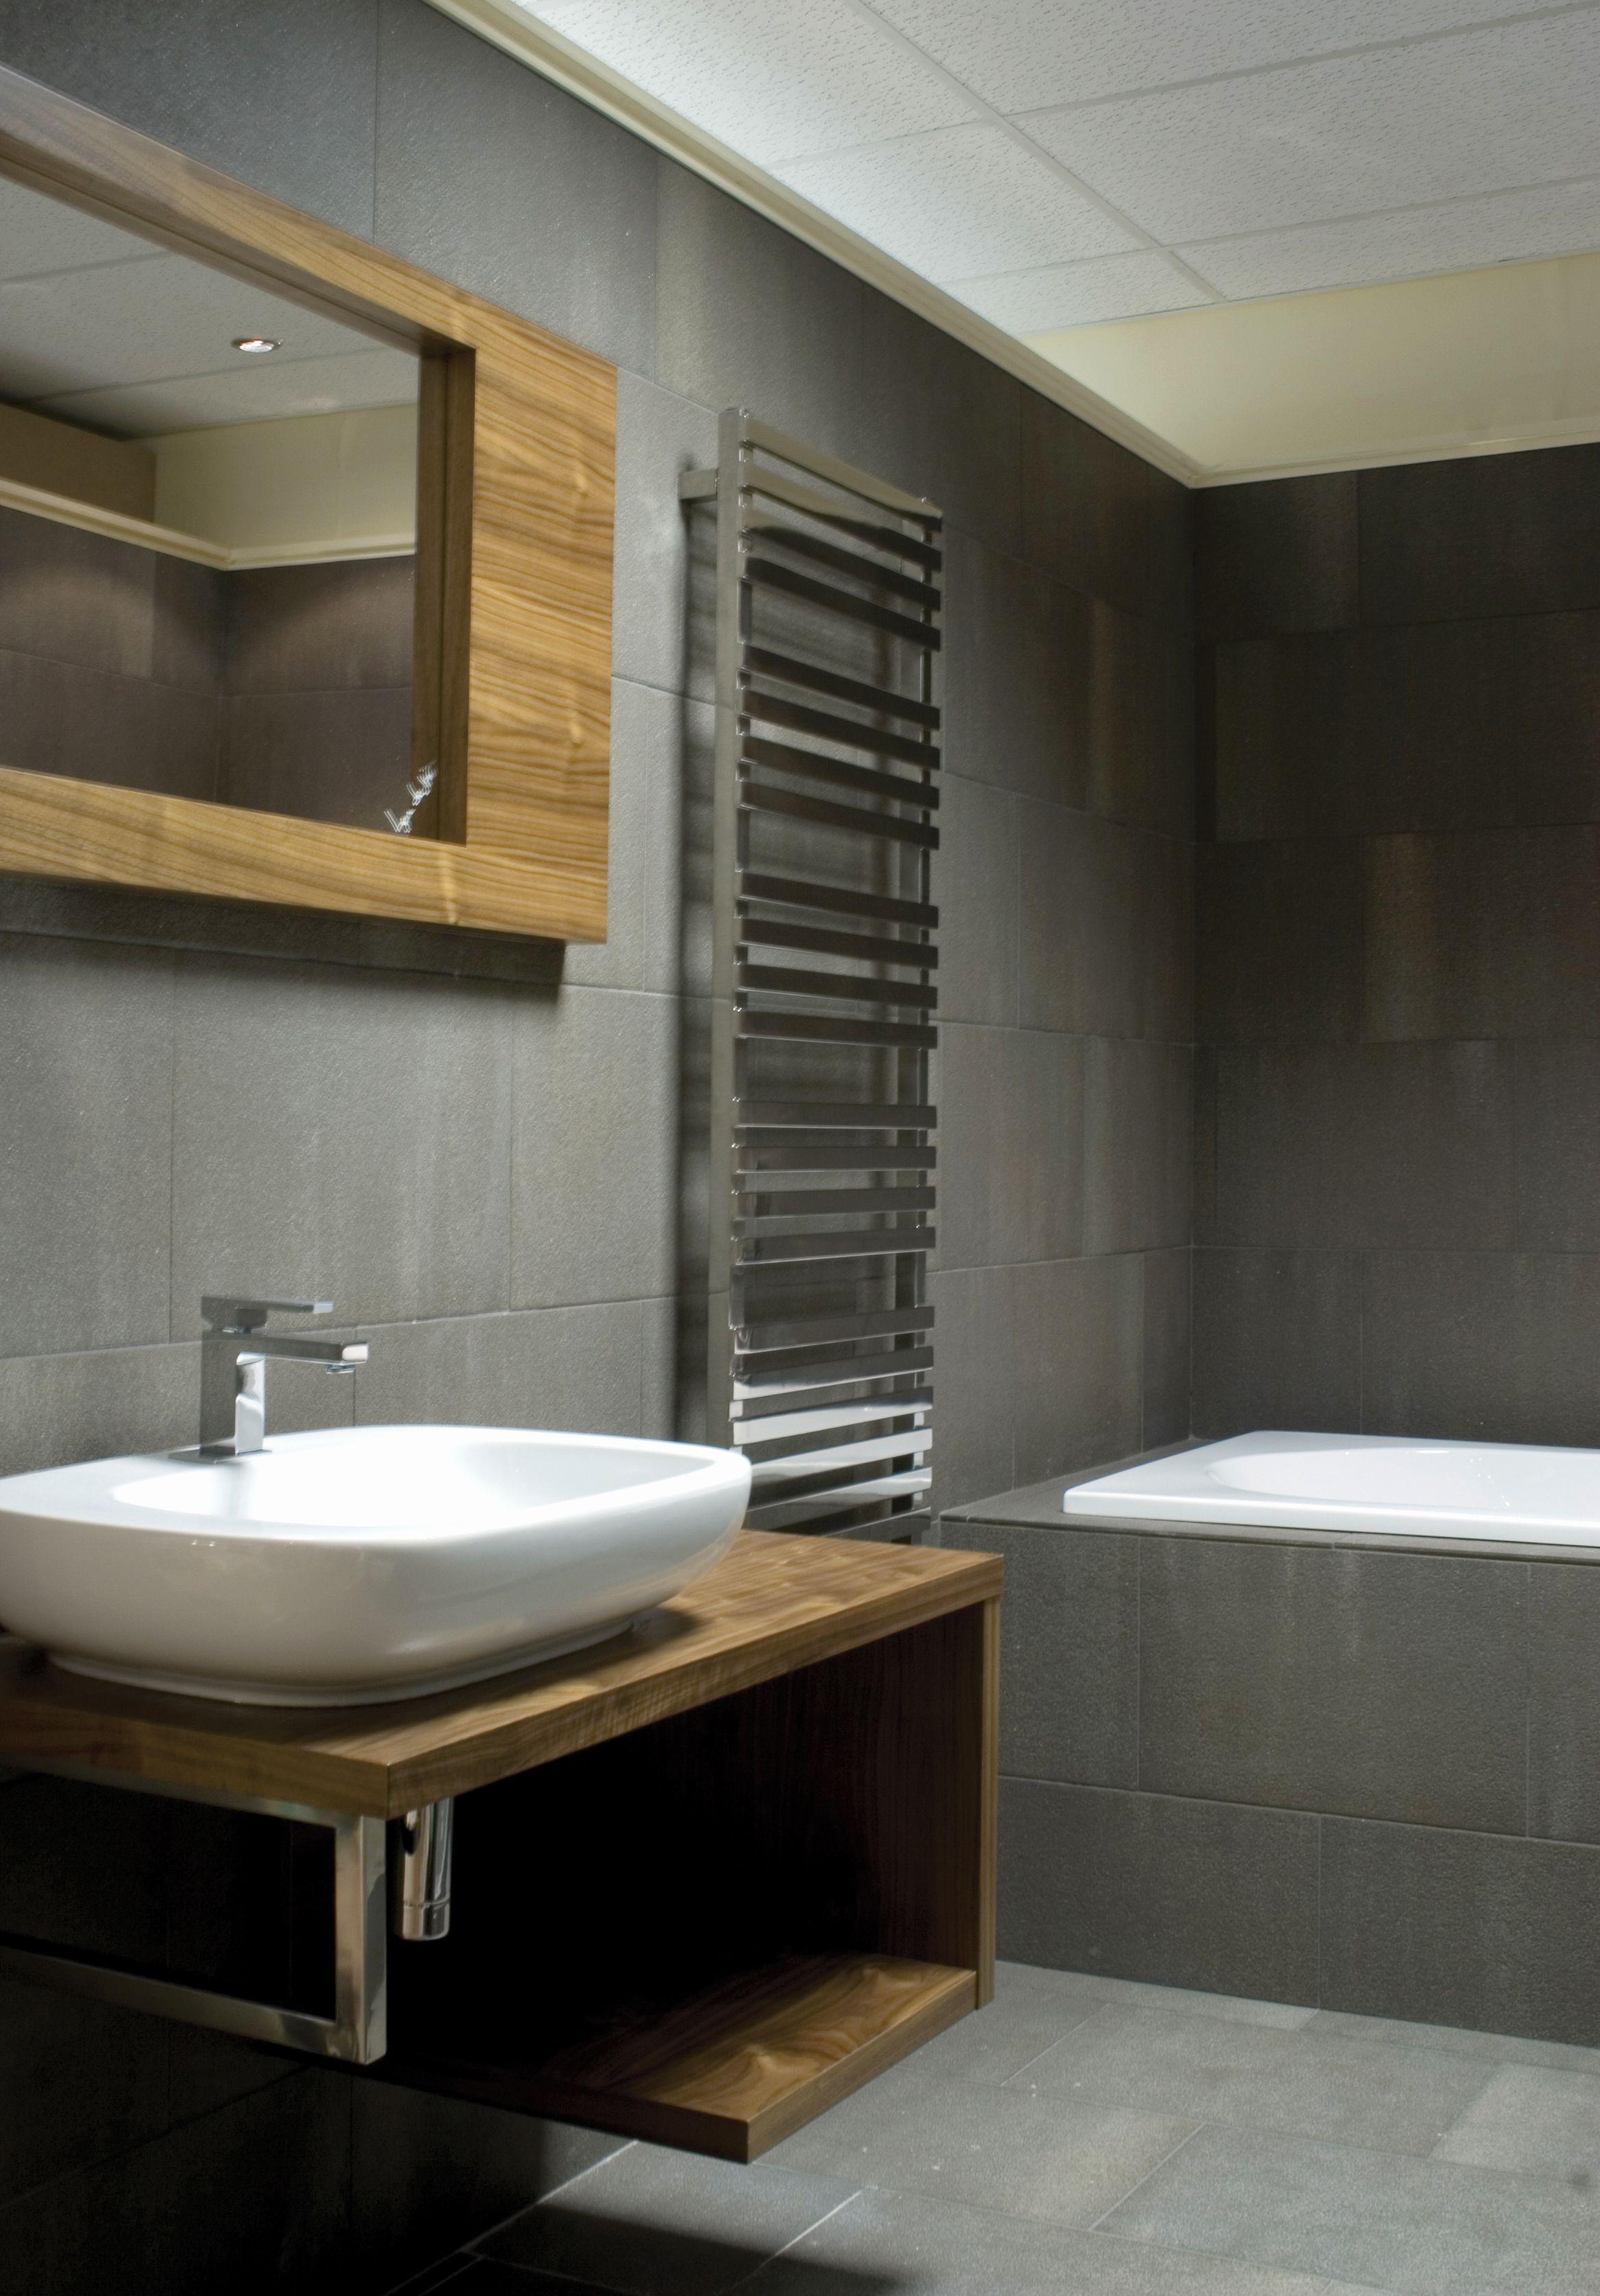 Stainless steel Kubik Mini towel warmer